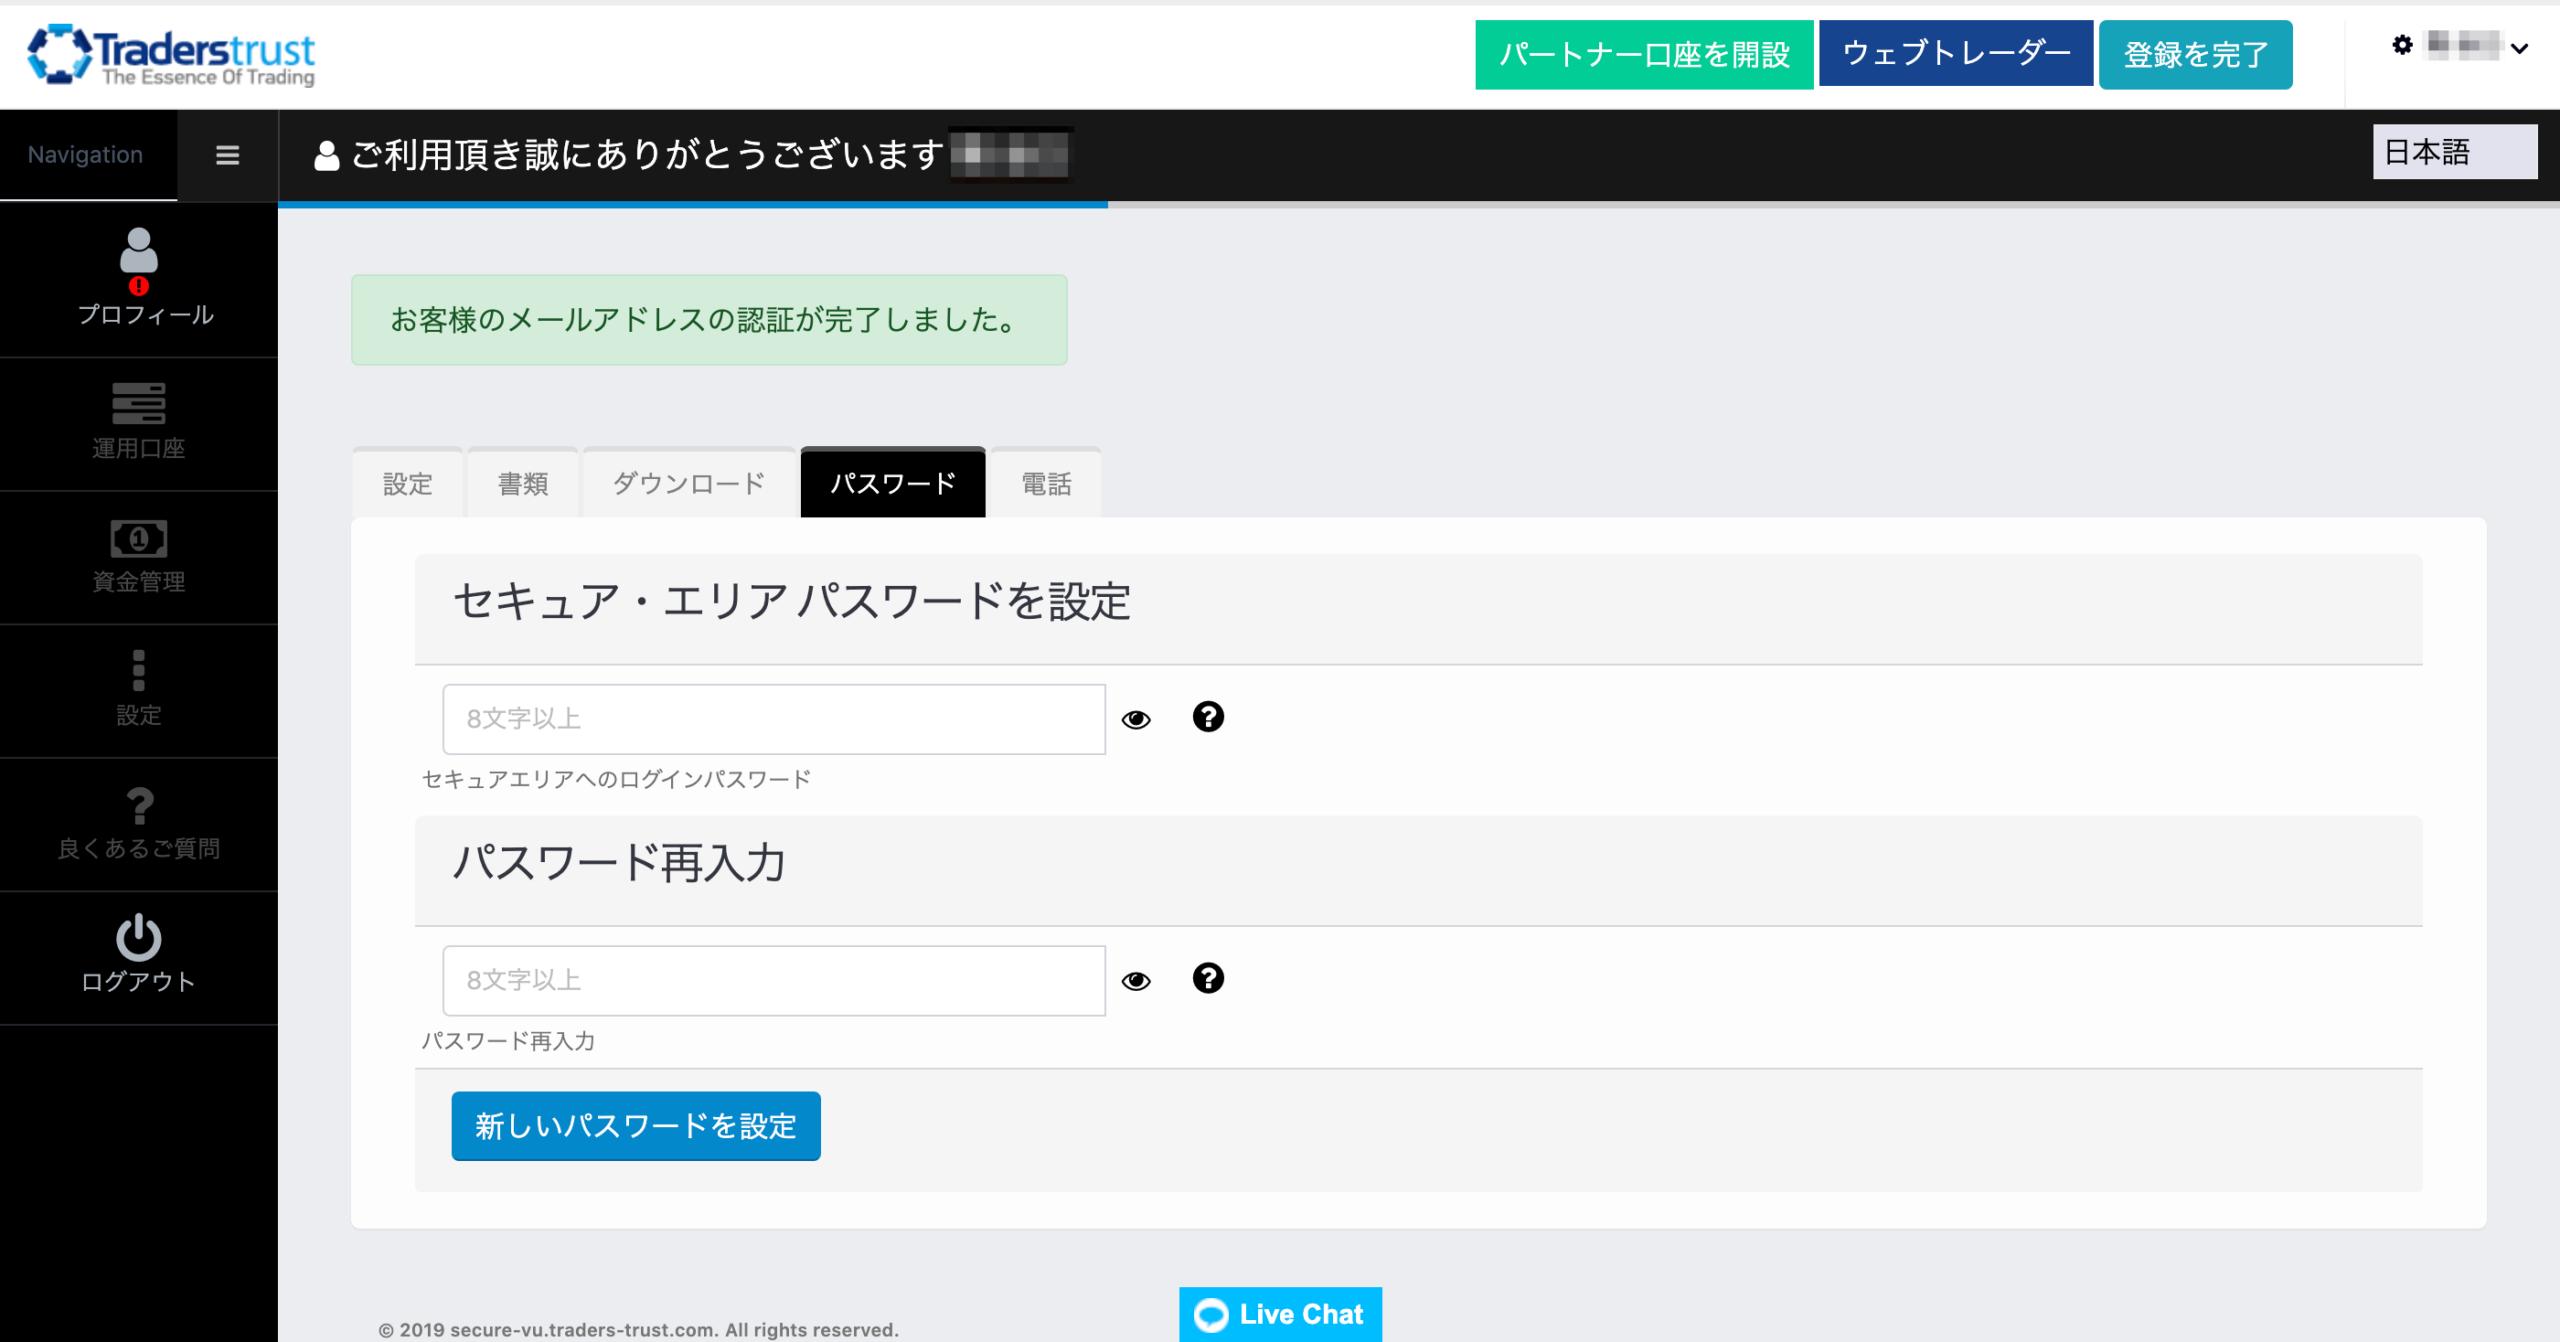 TreadersTrustメール認証完了、パスワード設定